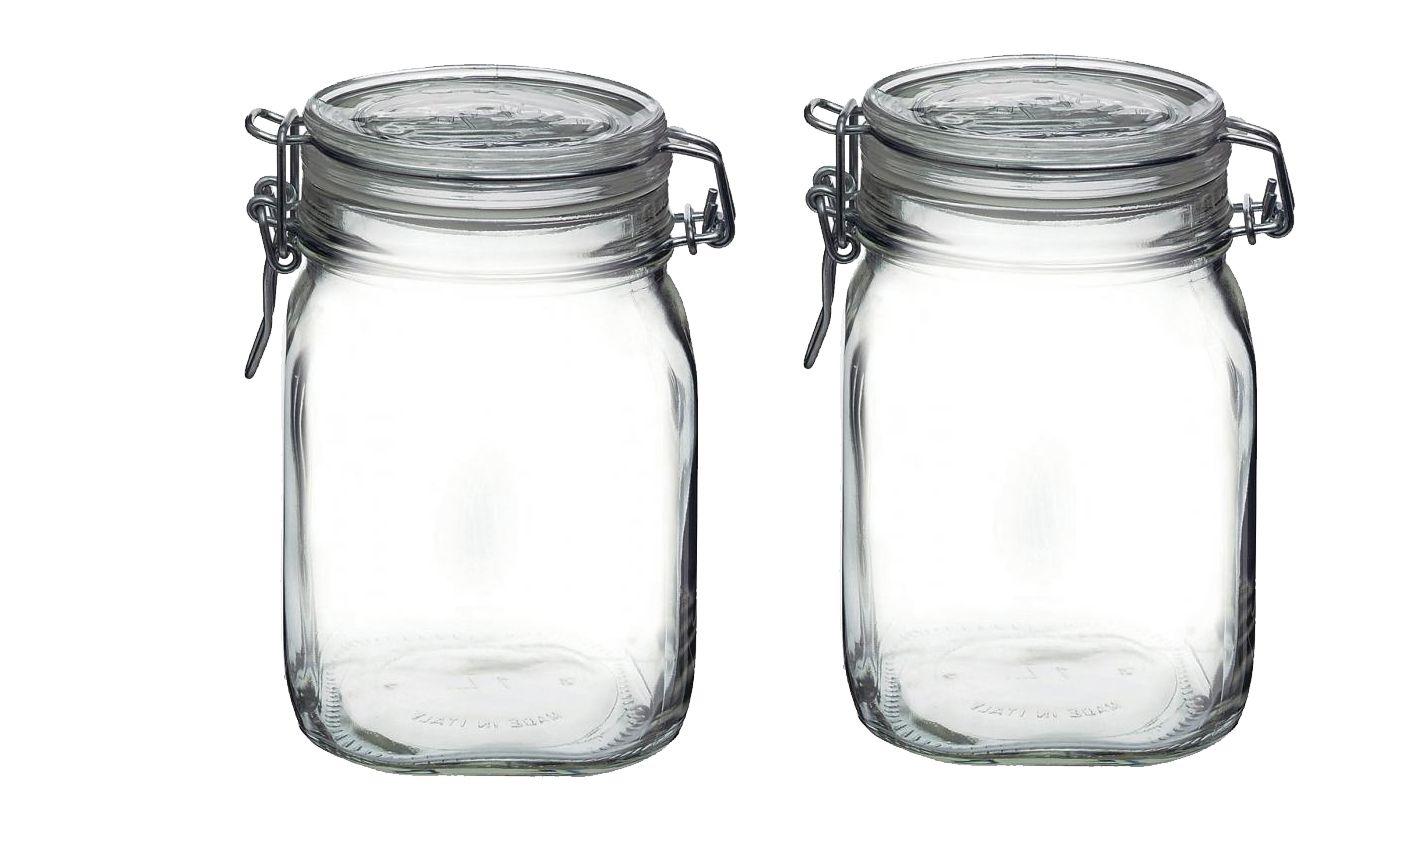 Conjunto Com 2 Potes Herméticos de Vidro Fido Fecho Metal Para Condimentos 1000 ml